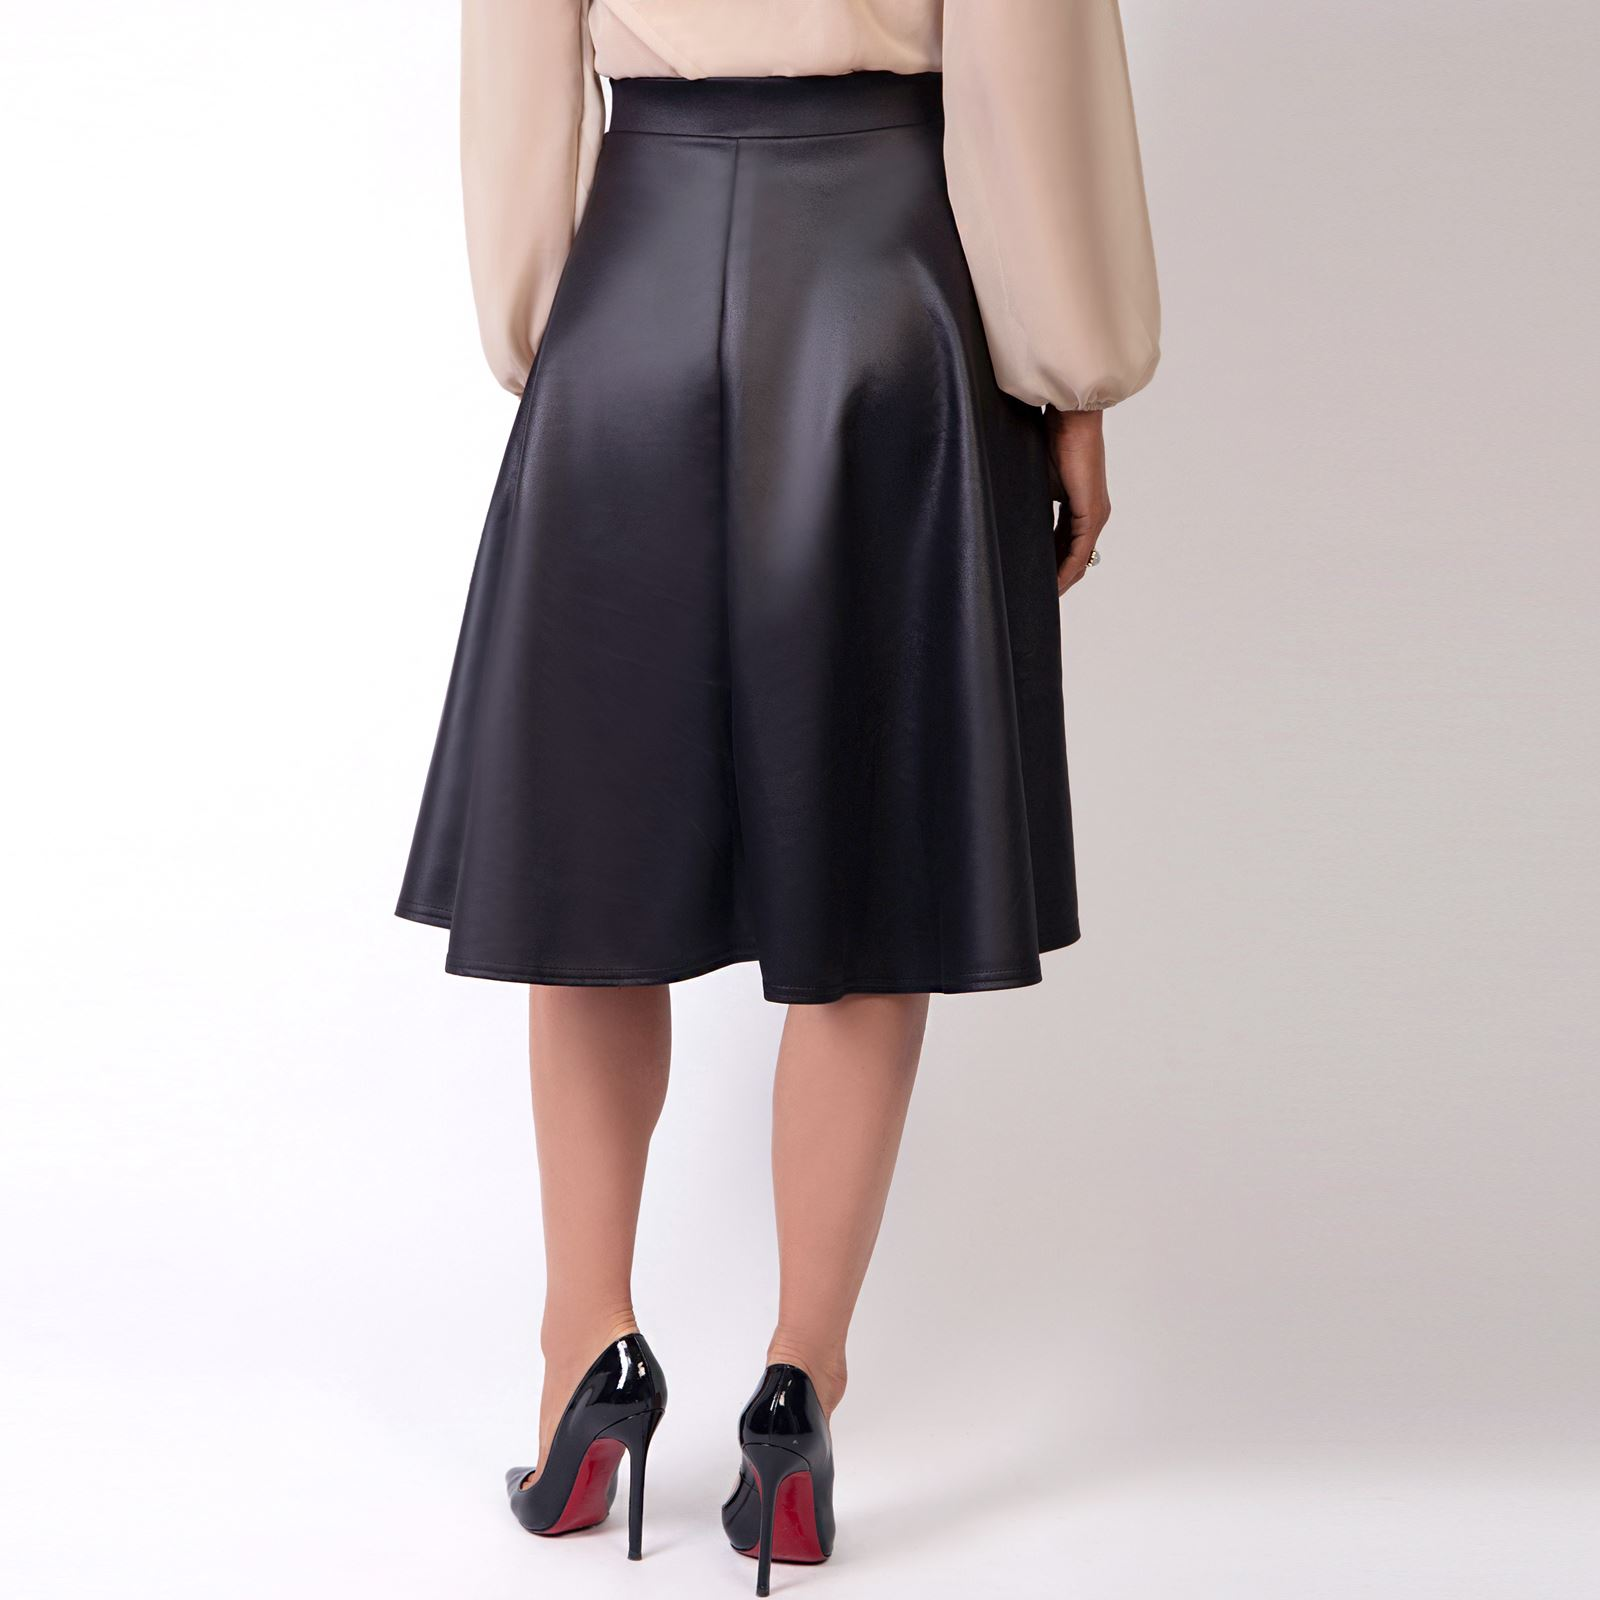 Womens-Ladies-PVC-Leather-Skirt-Pleated-Midi-Flared-A-Line-Full-Swing-High-Waist thumbnail 3